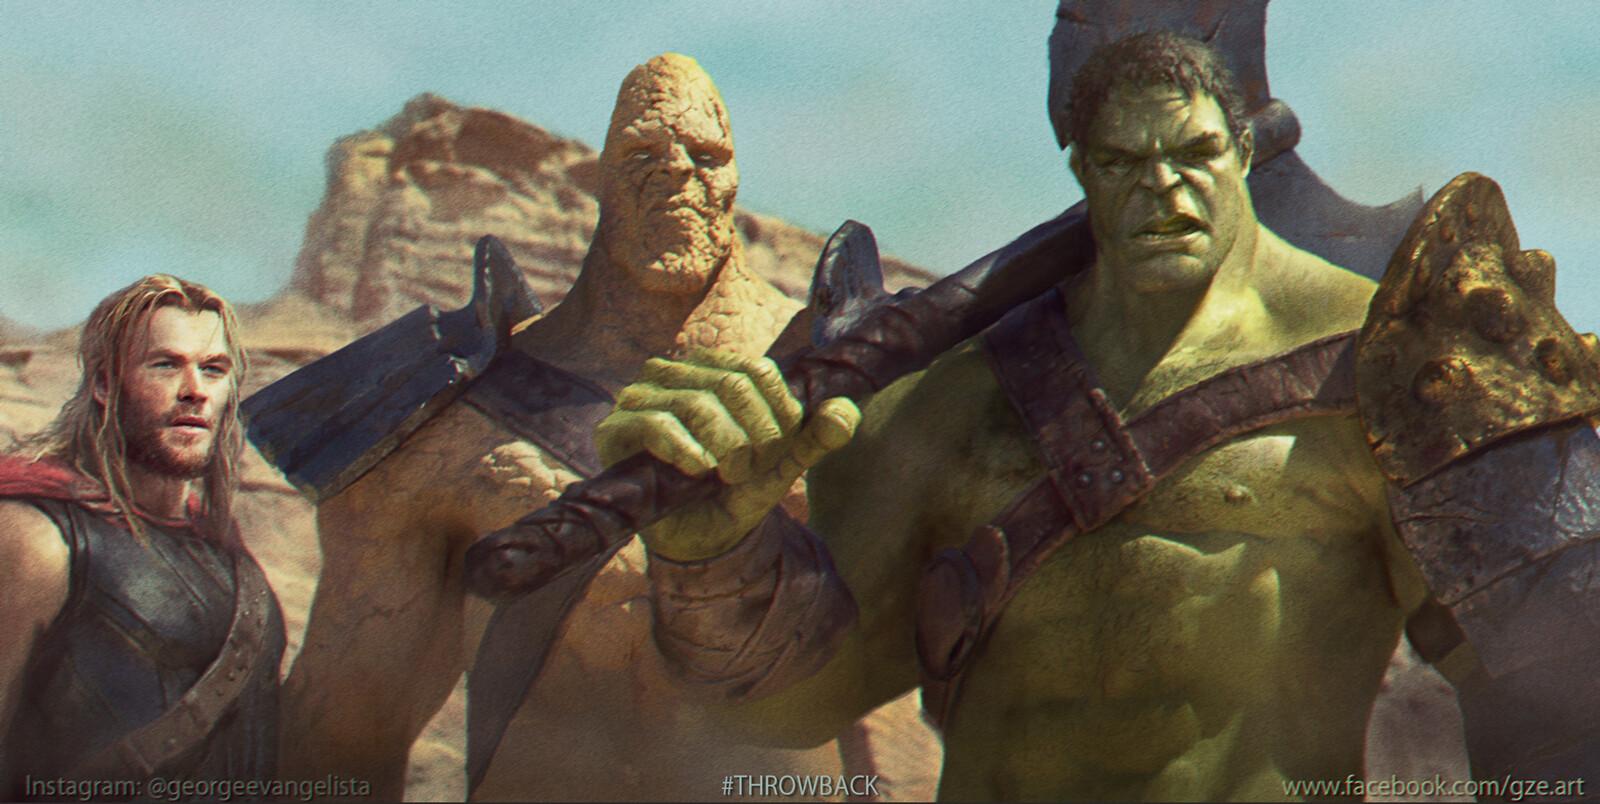 Hulk Thor and Korg